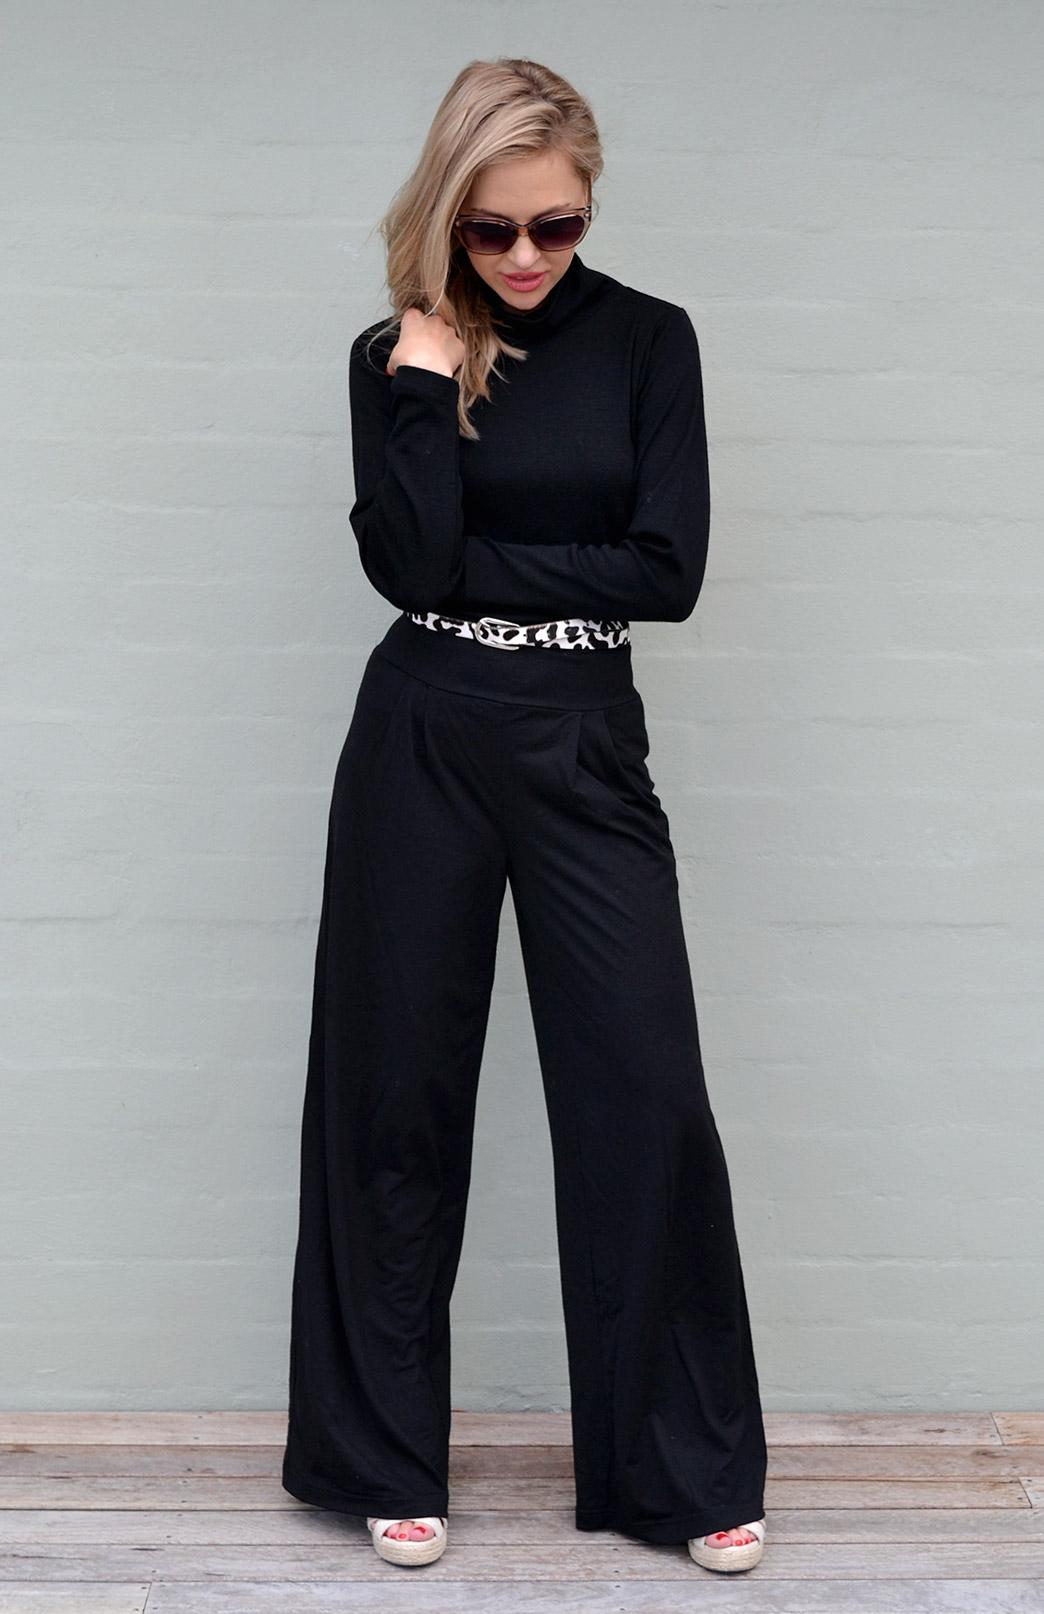 Palazzo Pants - Midweight - Women's Black Merino Wool Flared Wide Leg Yoga Pants with wide waistband - Smitten Merino Tasmania Australia